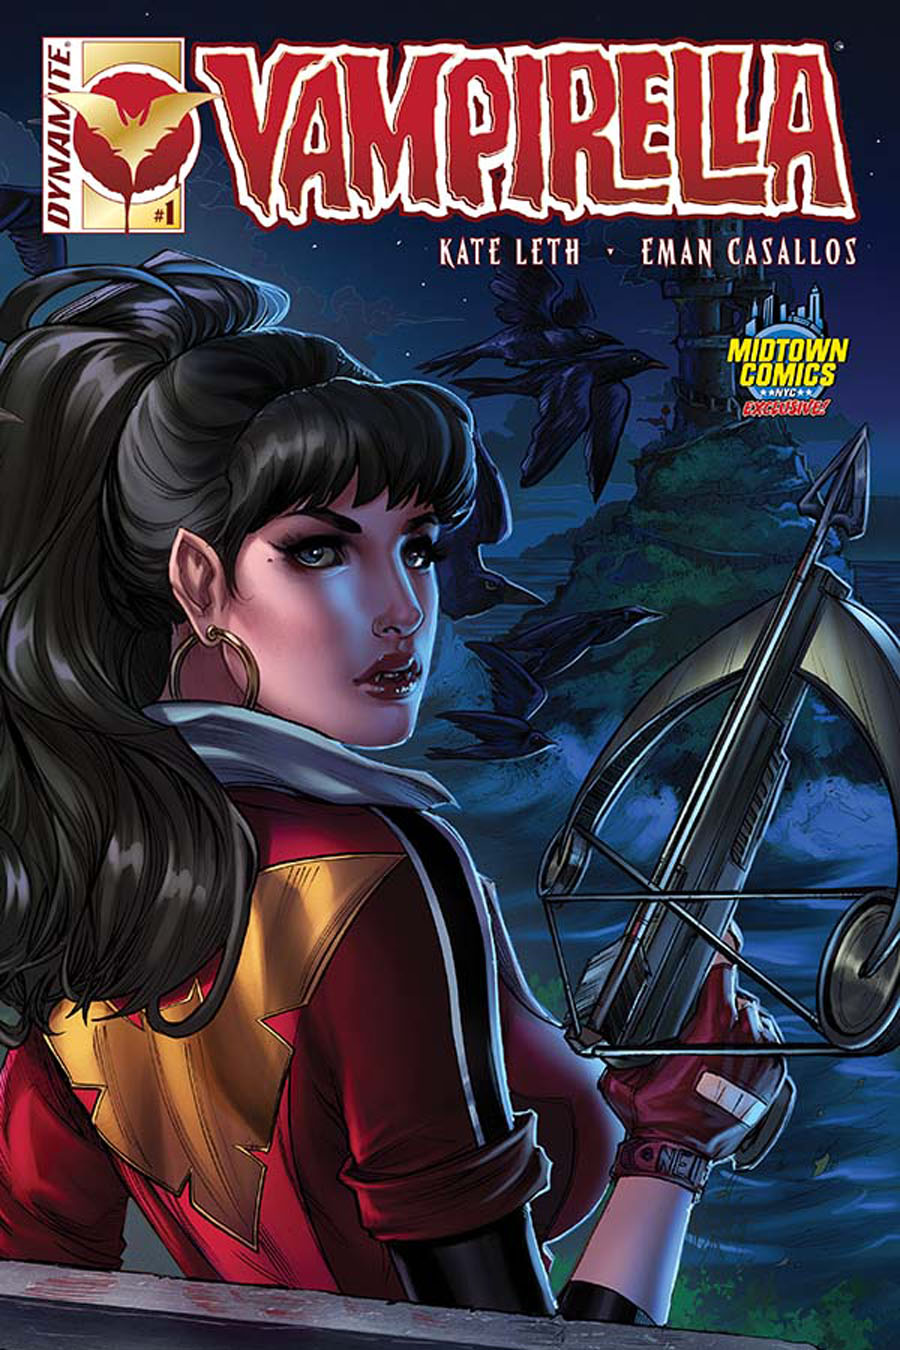 Vampirella Vol 6 #1 Cover B Midtown Exclusive Nei Ruffino Connecting Color Variant Cover